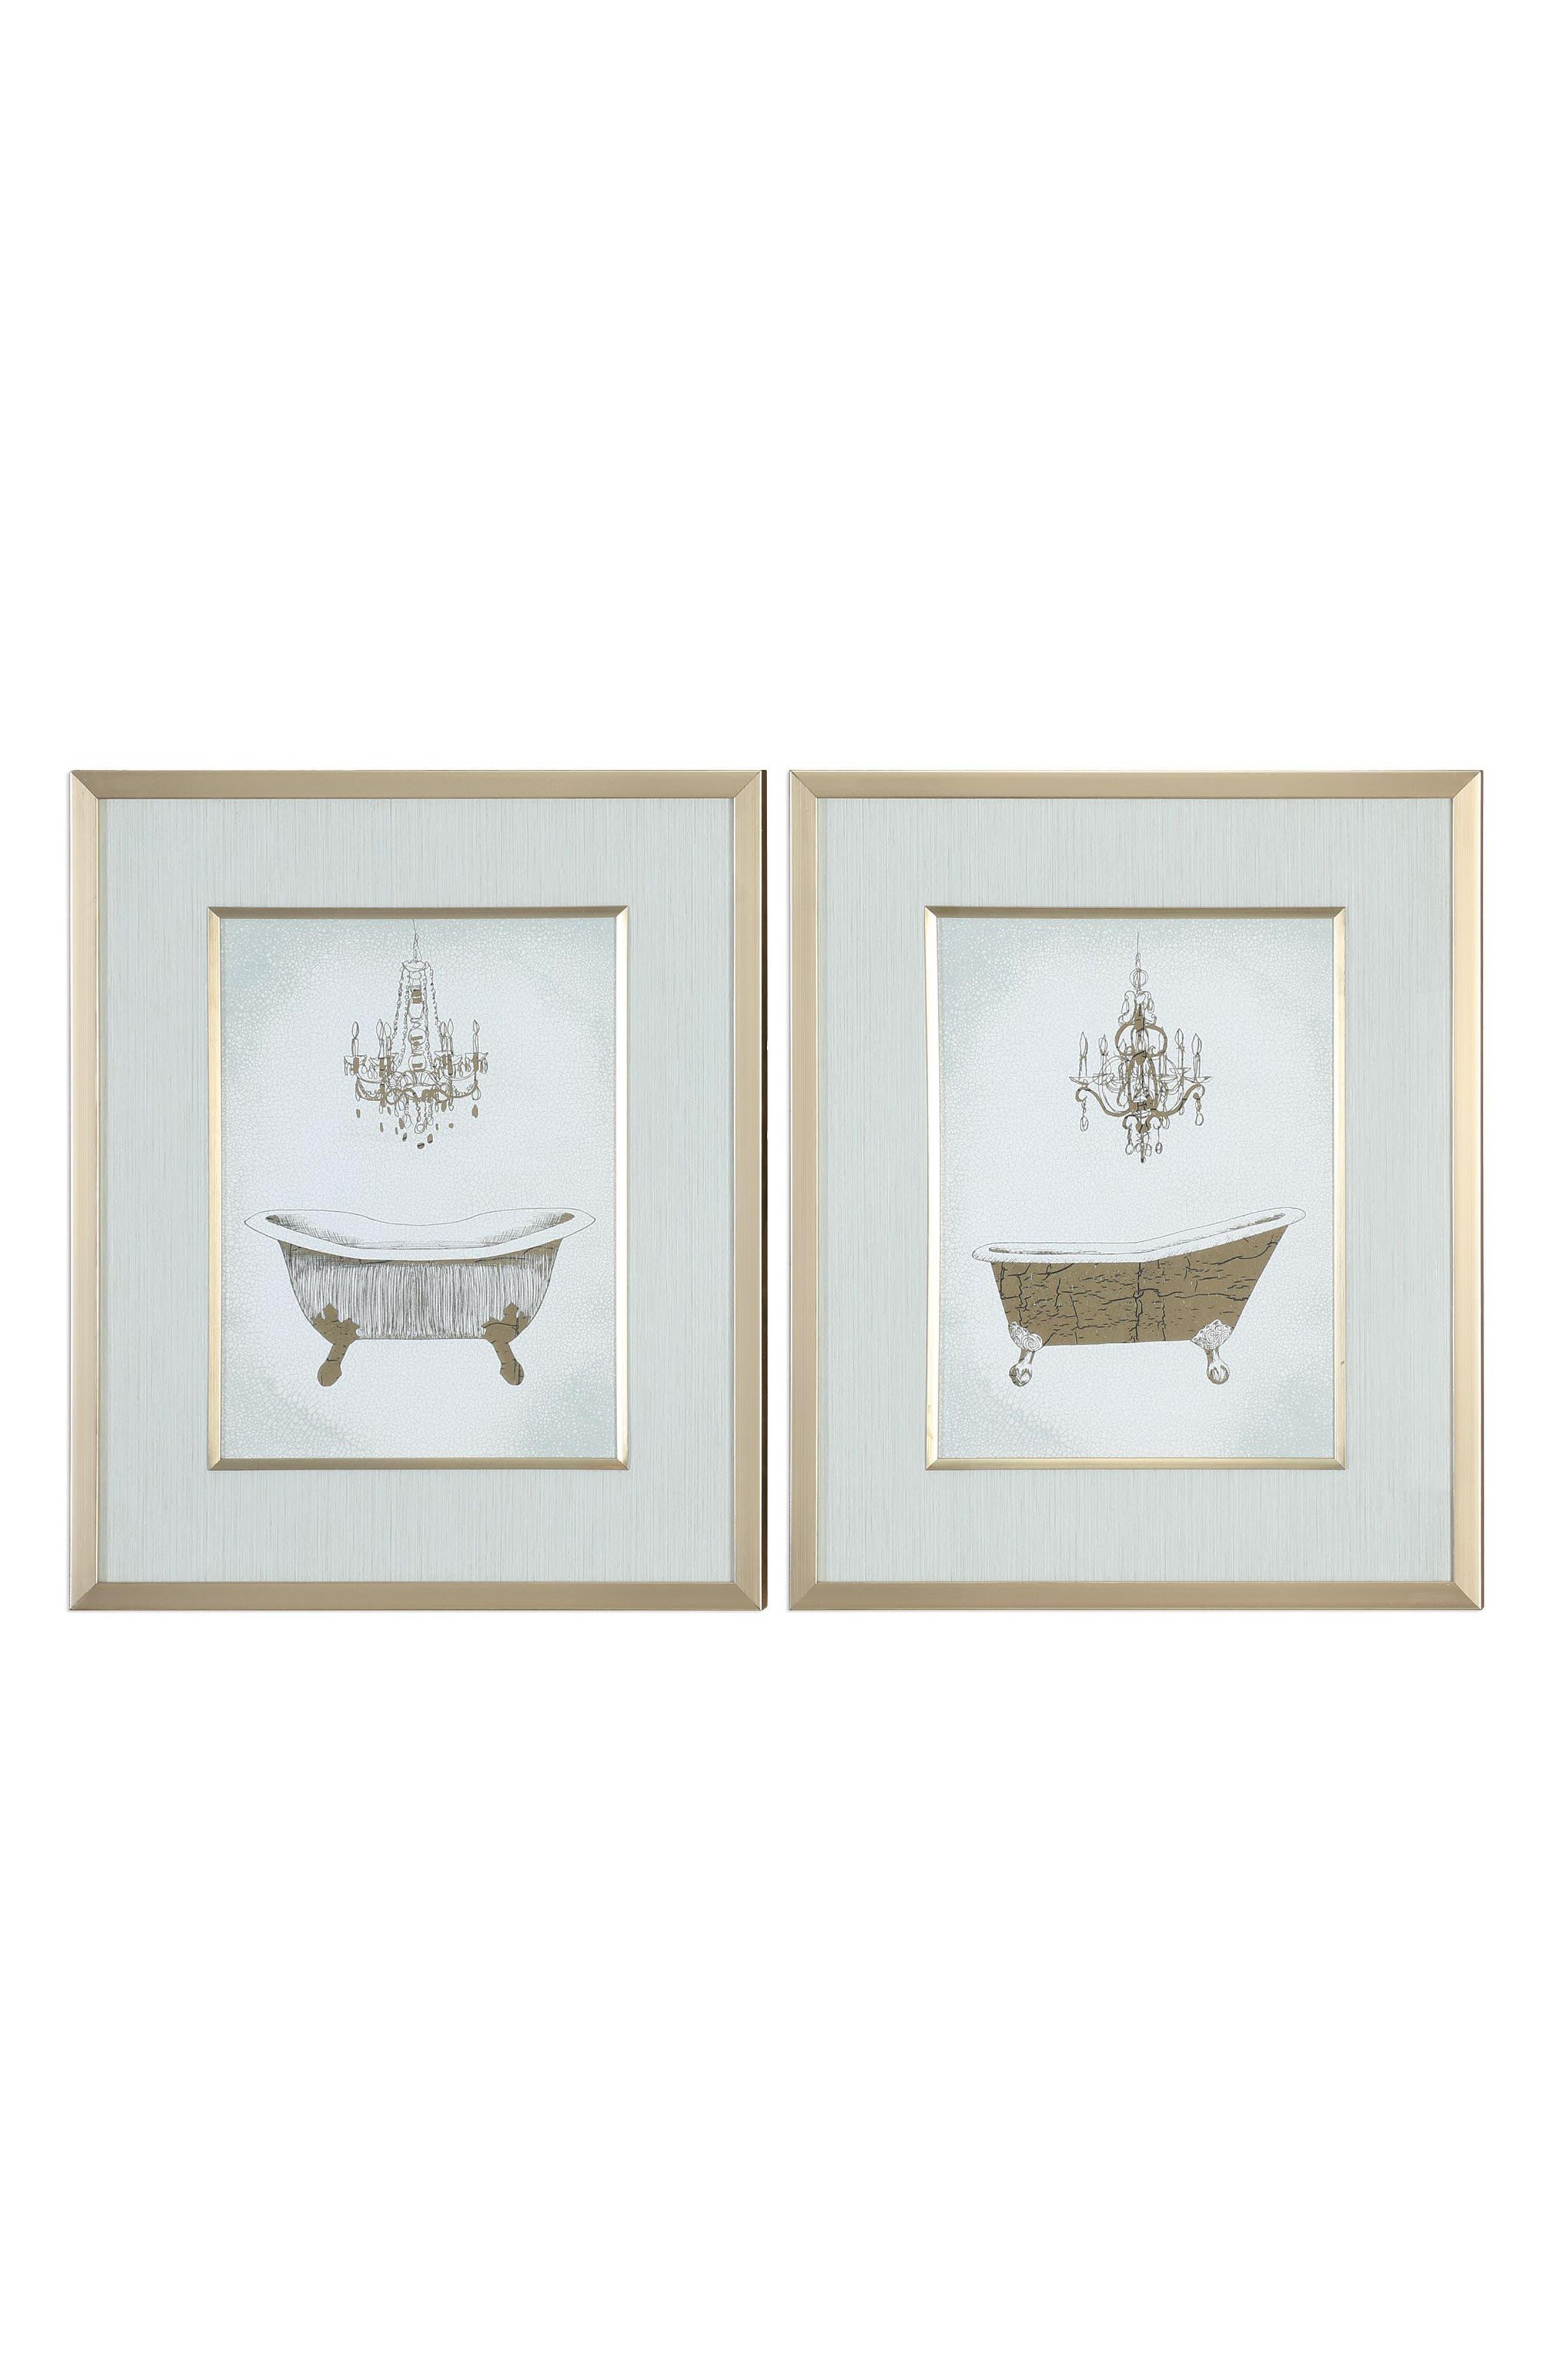 Gilded Bath Set of 2 Art Prints,                             Main thumbnail 1, color,